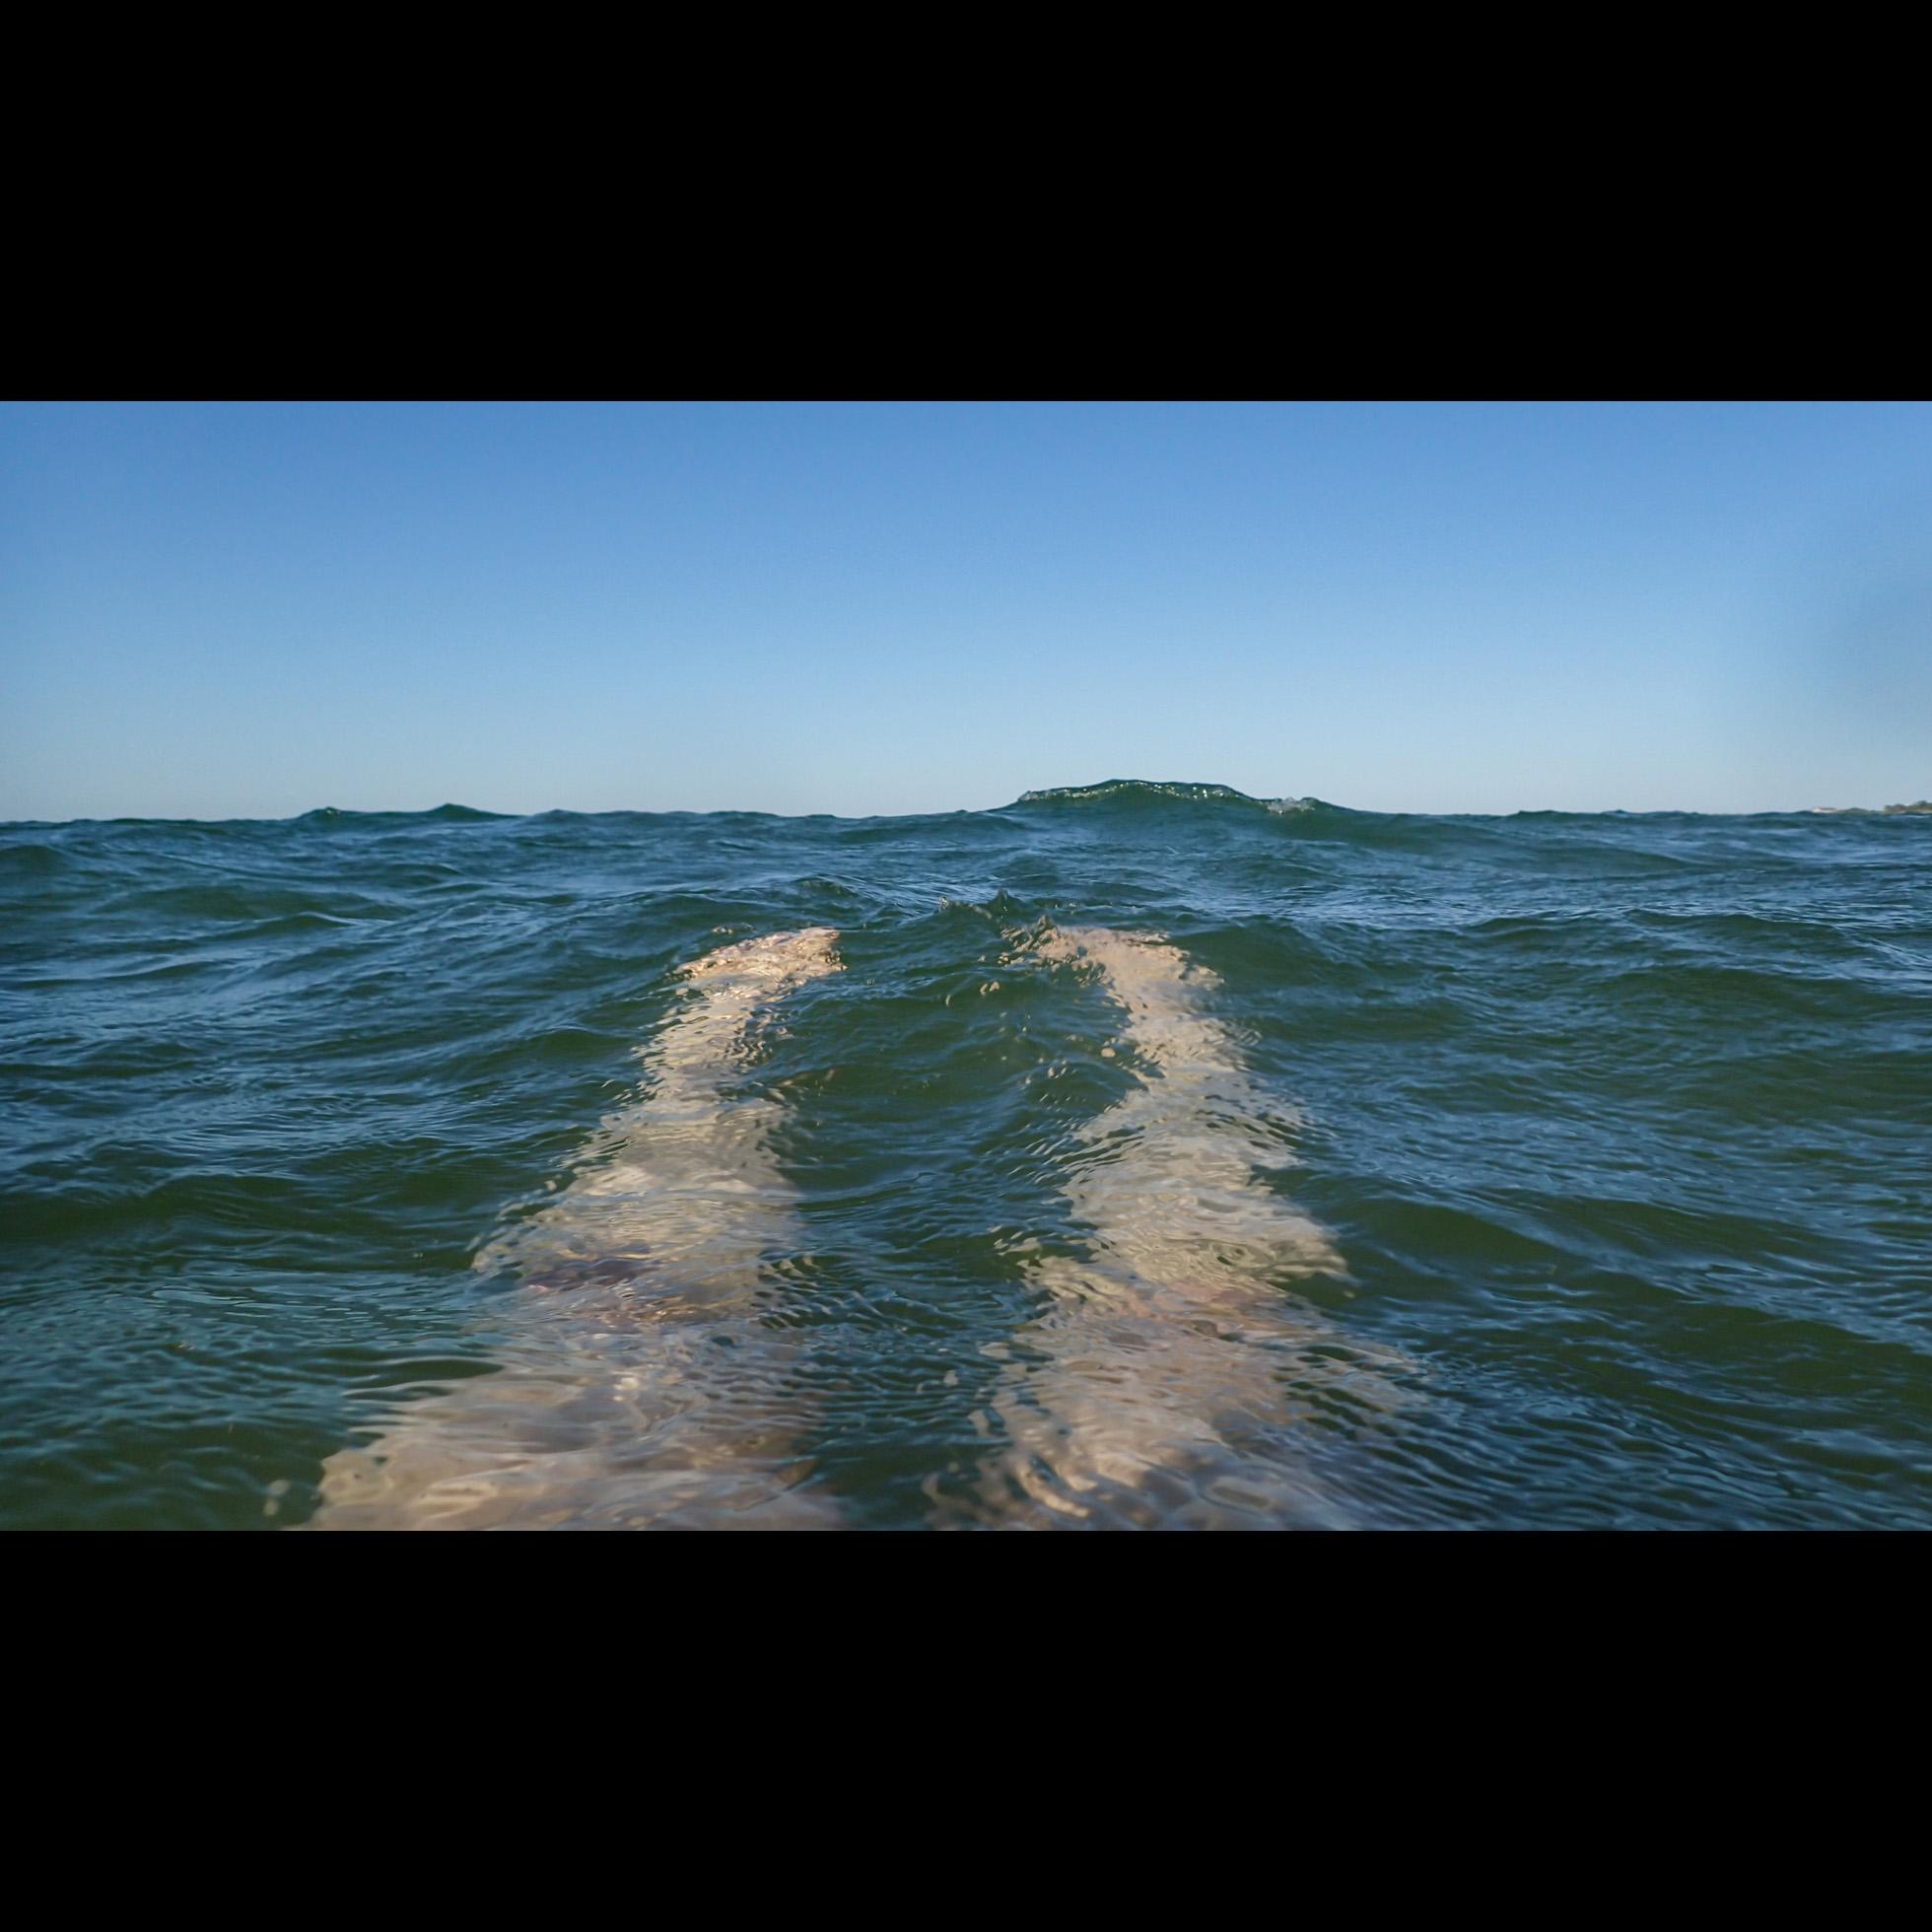 6.18 FIRST BEACH DAY